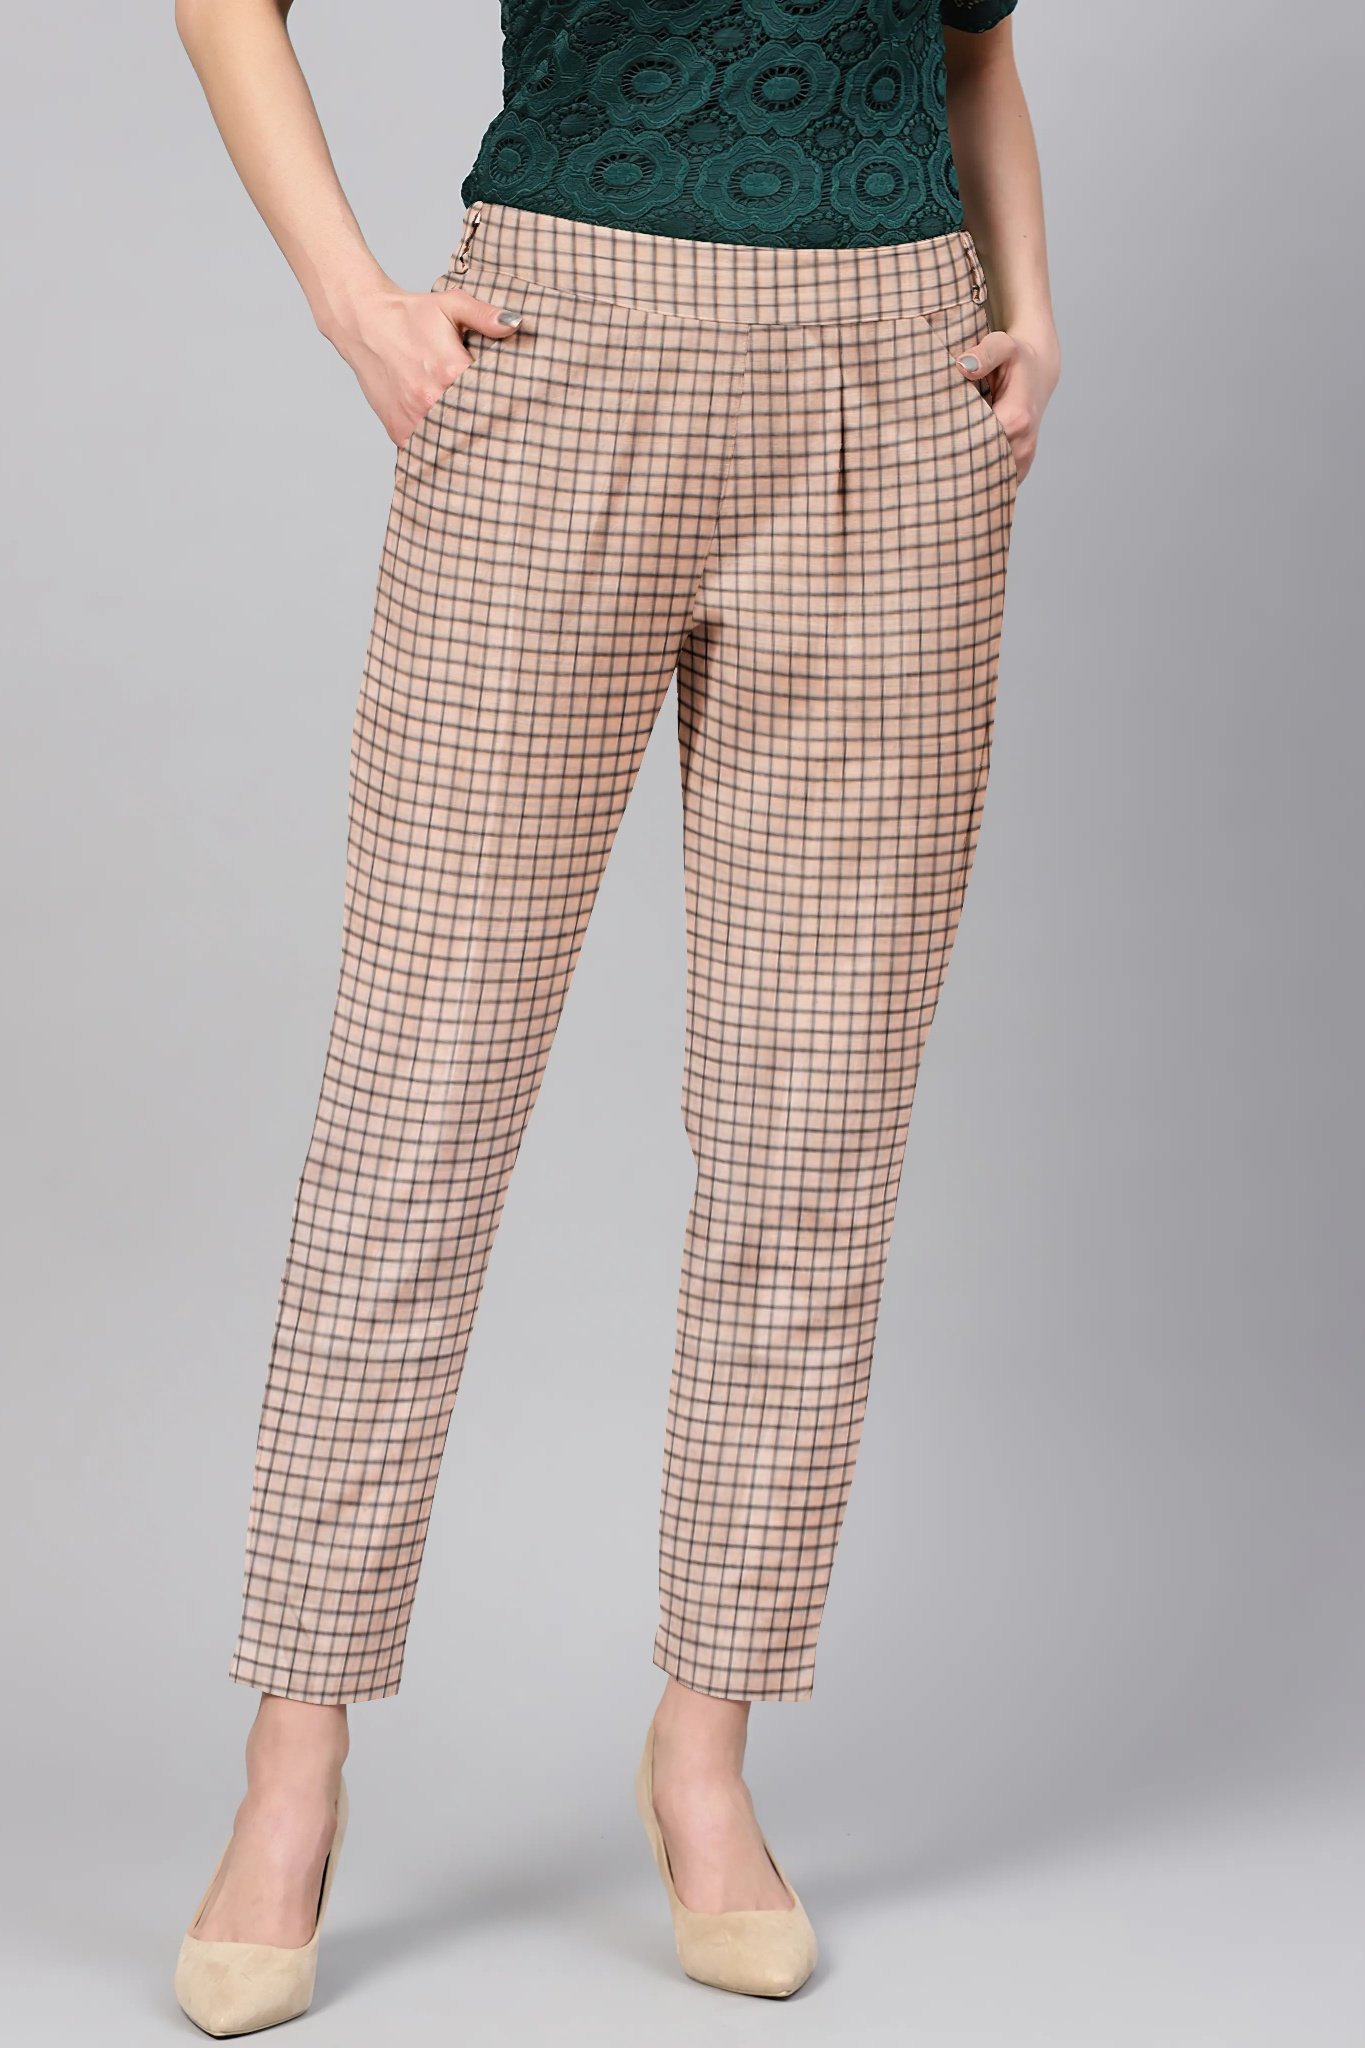 /home/customer/www/fabartcraft.com/public_html/uploadshttps://www.shopolics.com/uploads/images/medium/Cream-Black-Cotton-Check-Regular-Fit-Solid-Trouser-36109.jpg